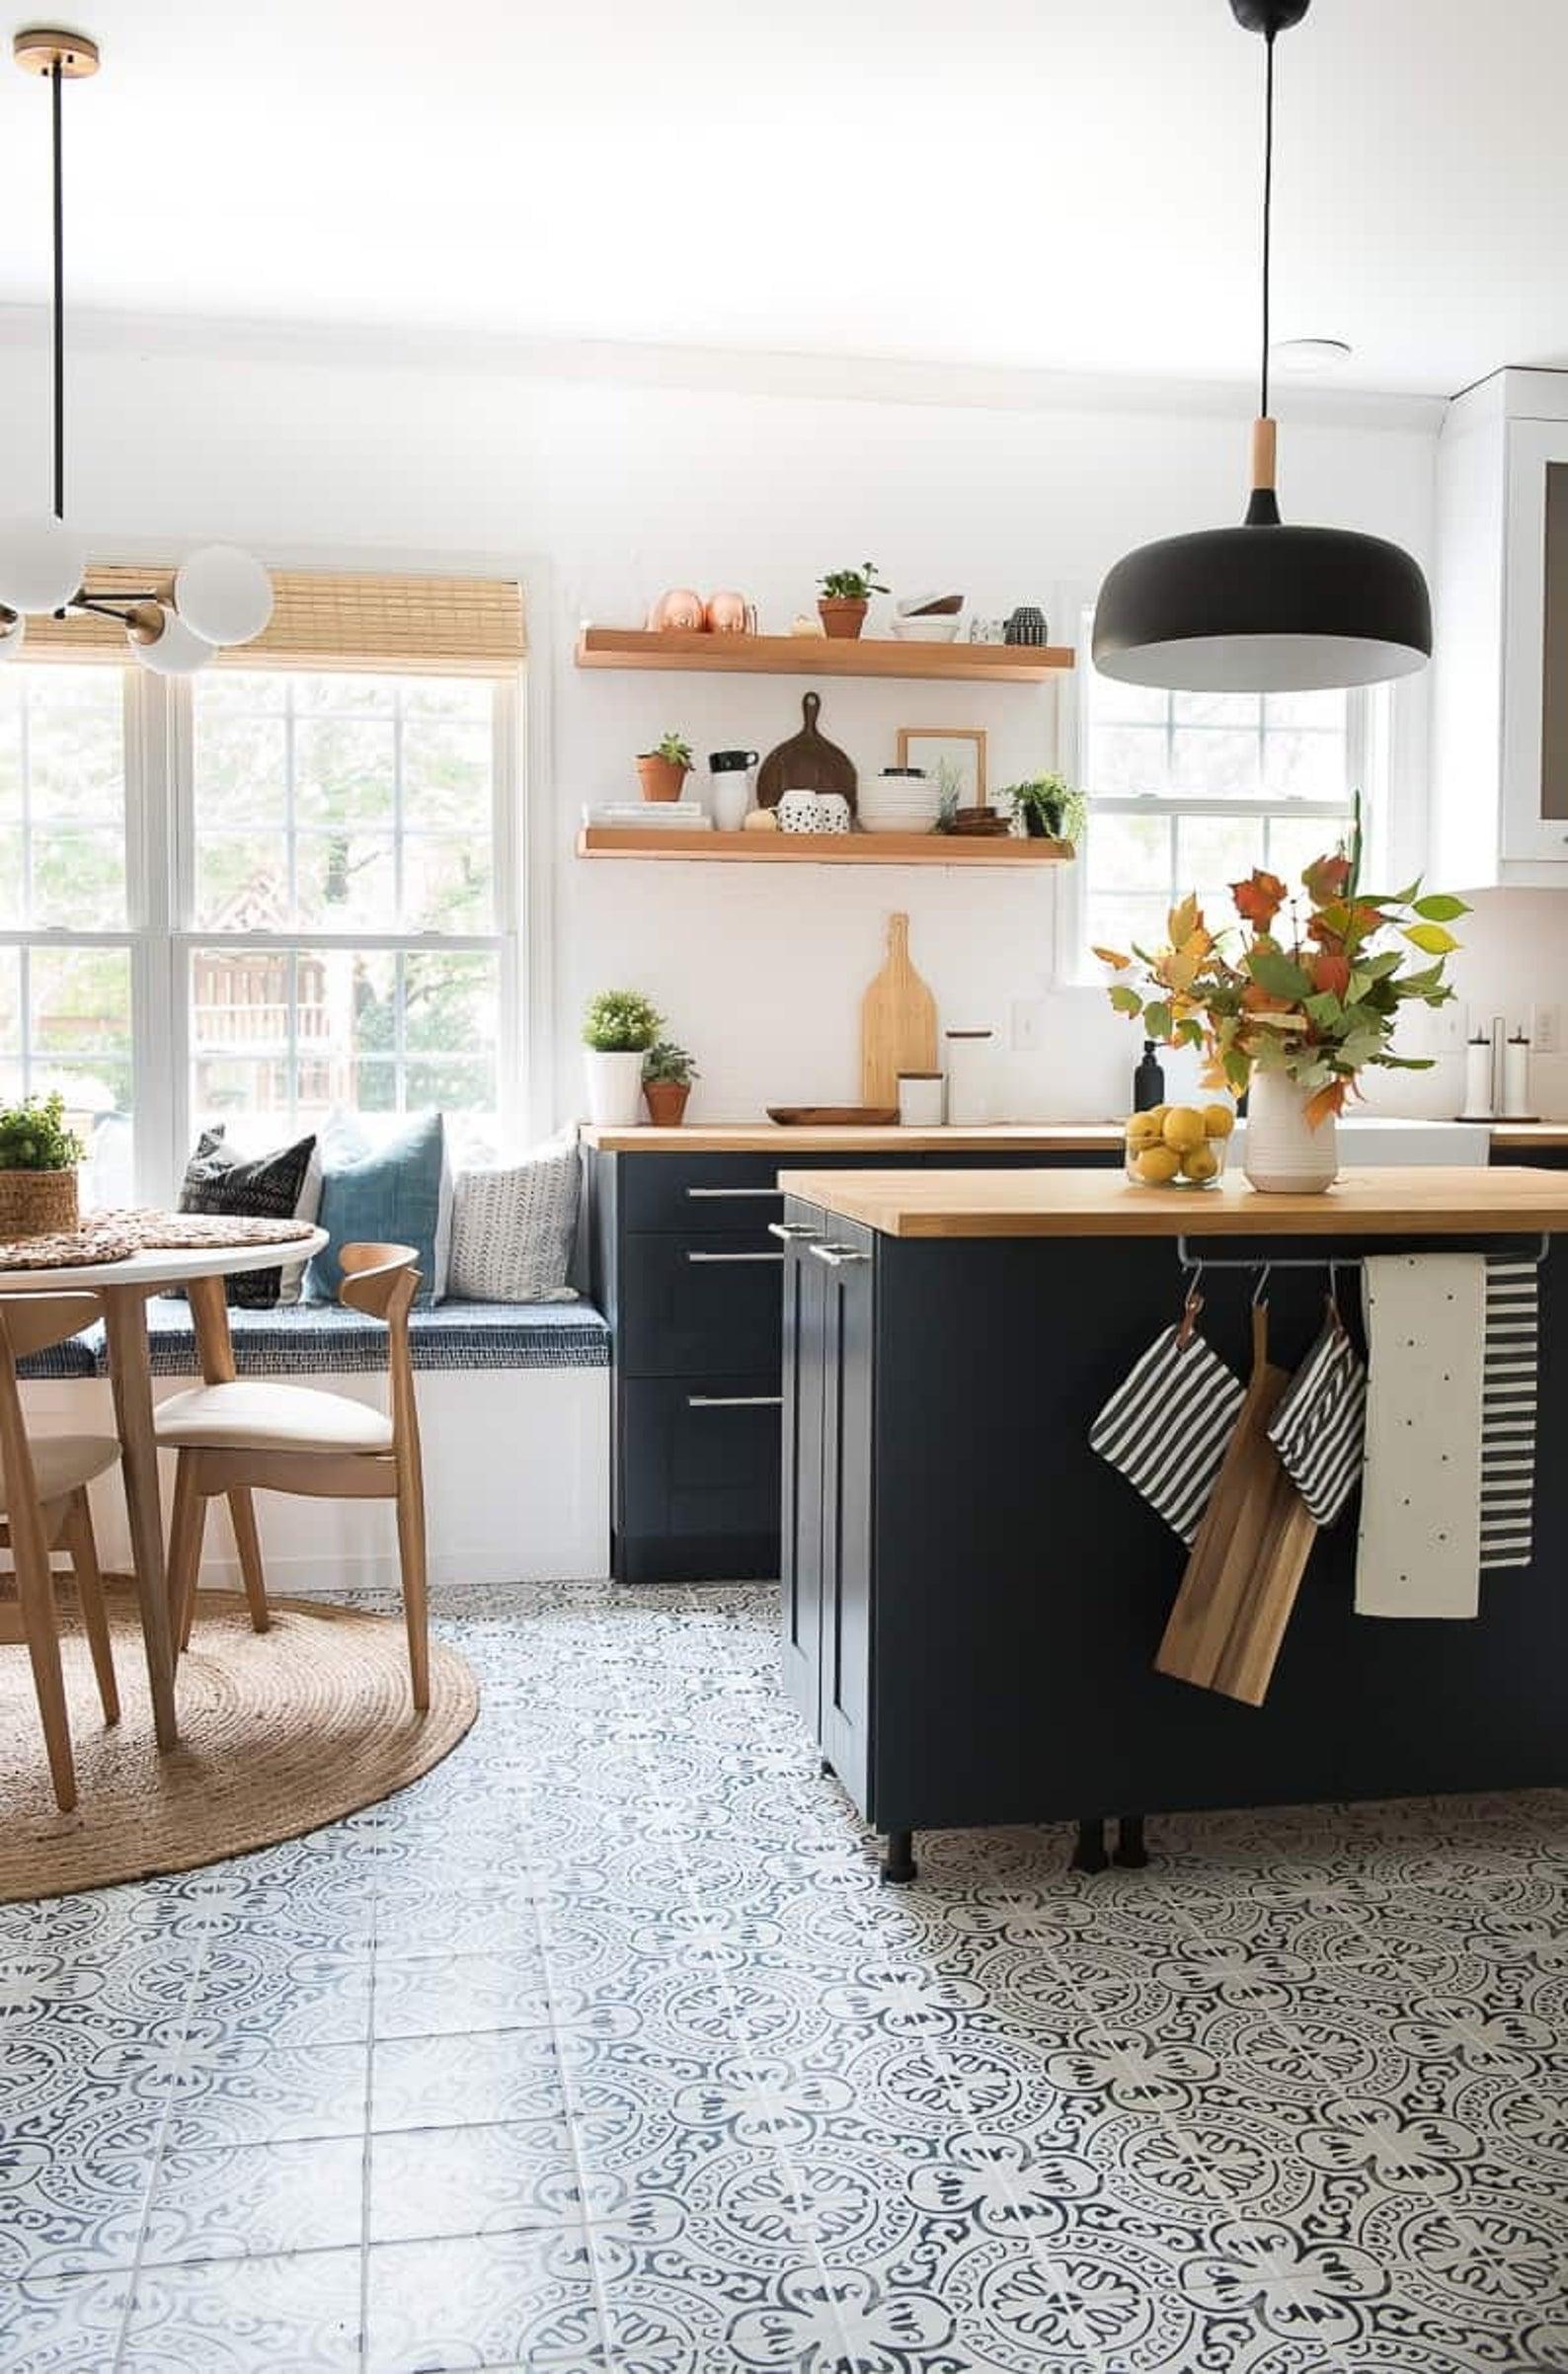 Upgrade Your Apartment Using Peel And Stick Floor Tiles Popsugar Home Australia